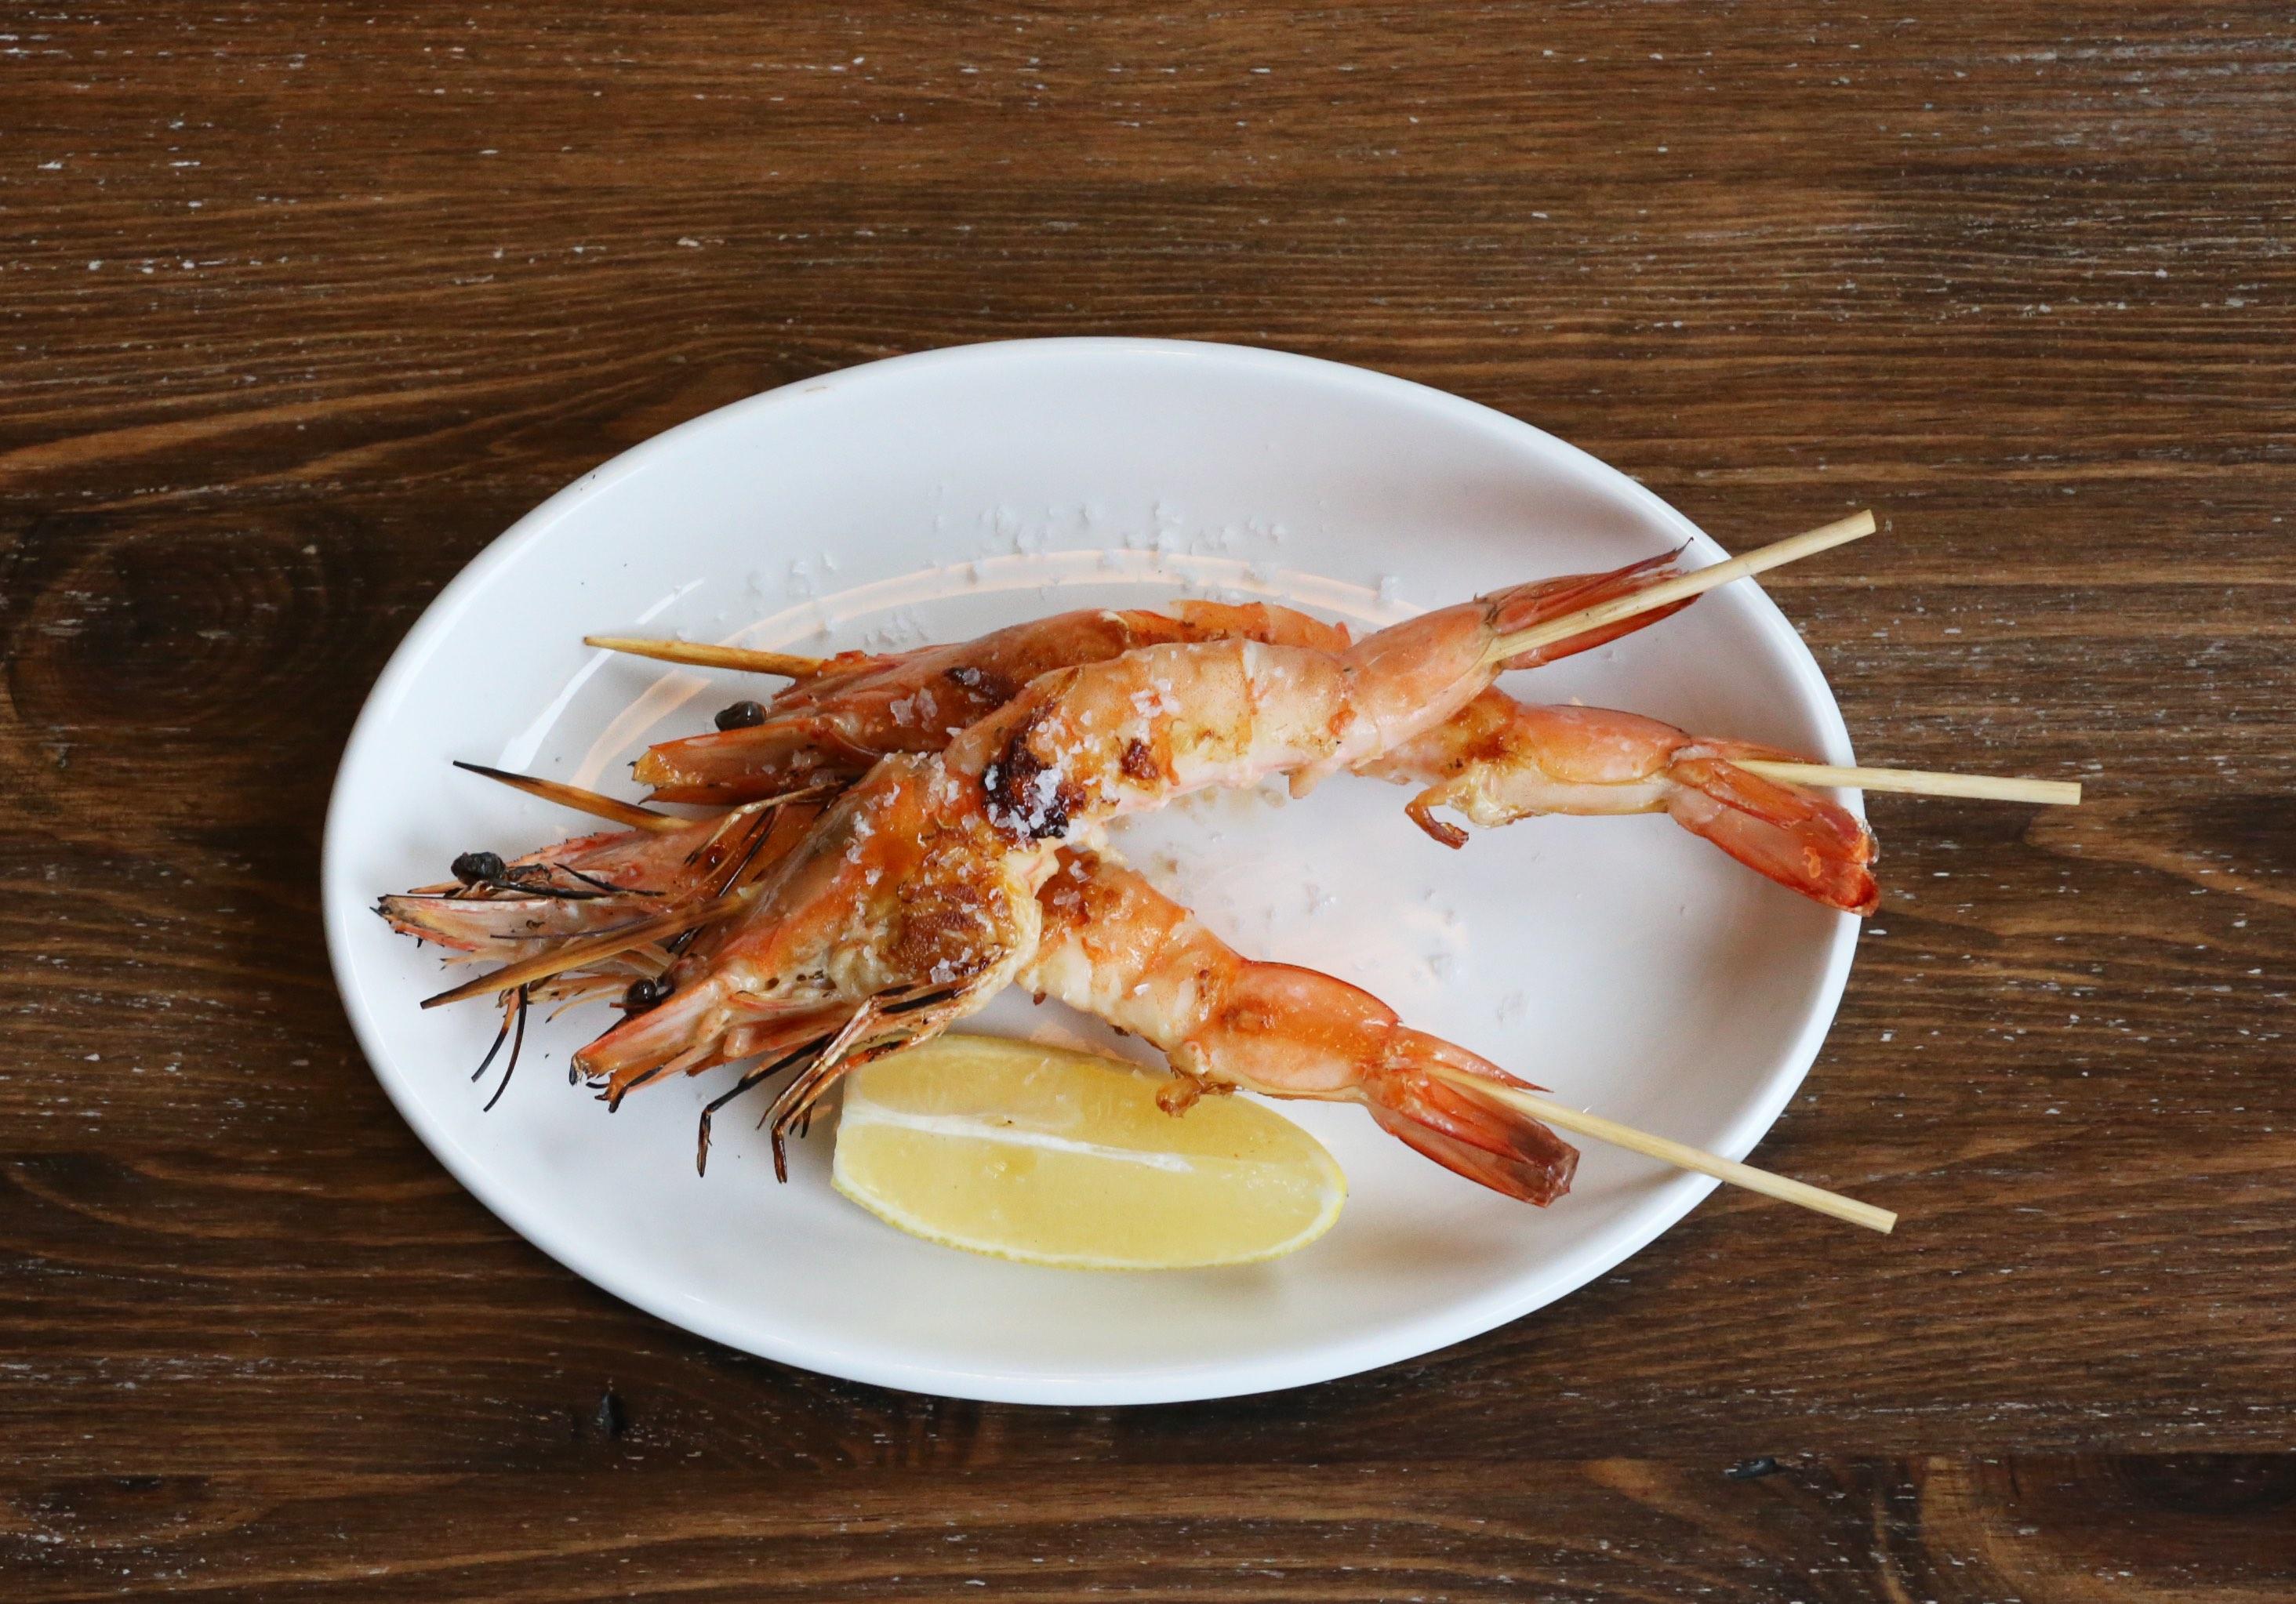 best seafood restaurant dublin, chew the fat podcast, GastroGays Chew The Fat, gastrogays podcast, Klaw Poke Dublin, Klaw restaurant Dublin, Niall Sabongi, Niall Sabongi Chew The Fat Podcast, Niall Sabongi restaurant, Niall Sabongi Restaurant dublin, oyster restaurant dublin, Seafood Cafe Dublin, seafood shellfish restaurant dublin, urban monger Dublin